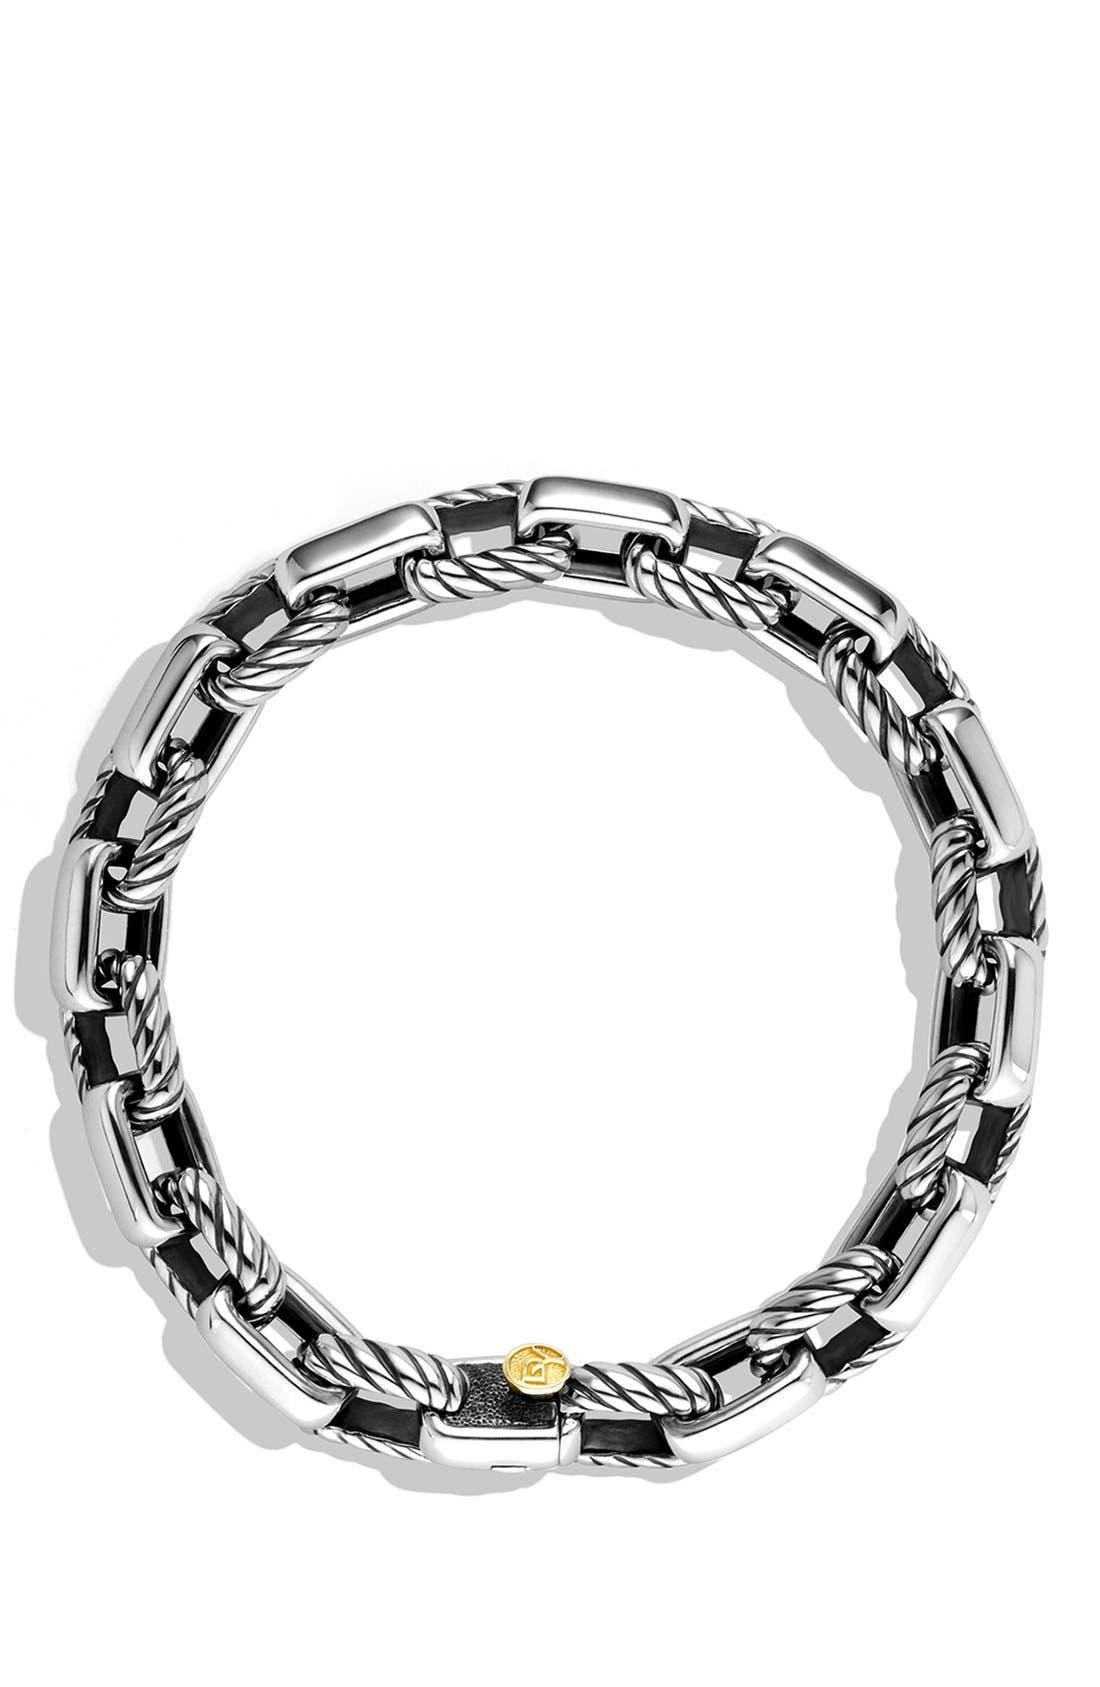 Alternate Image 2  - David Yurman 'Chain' Empire Link Bracelet with Gold